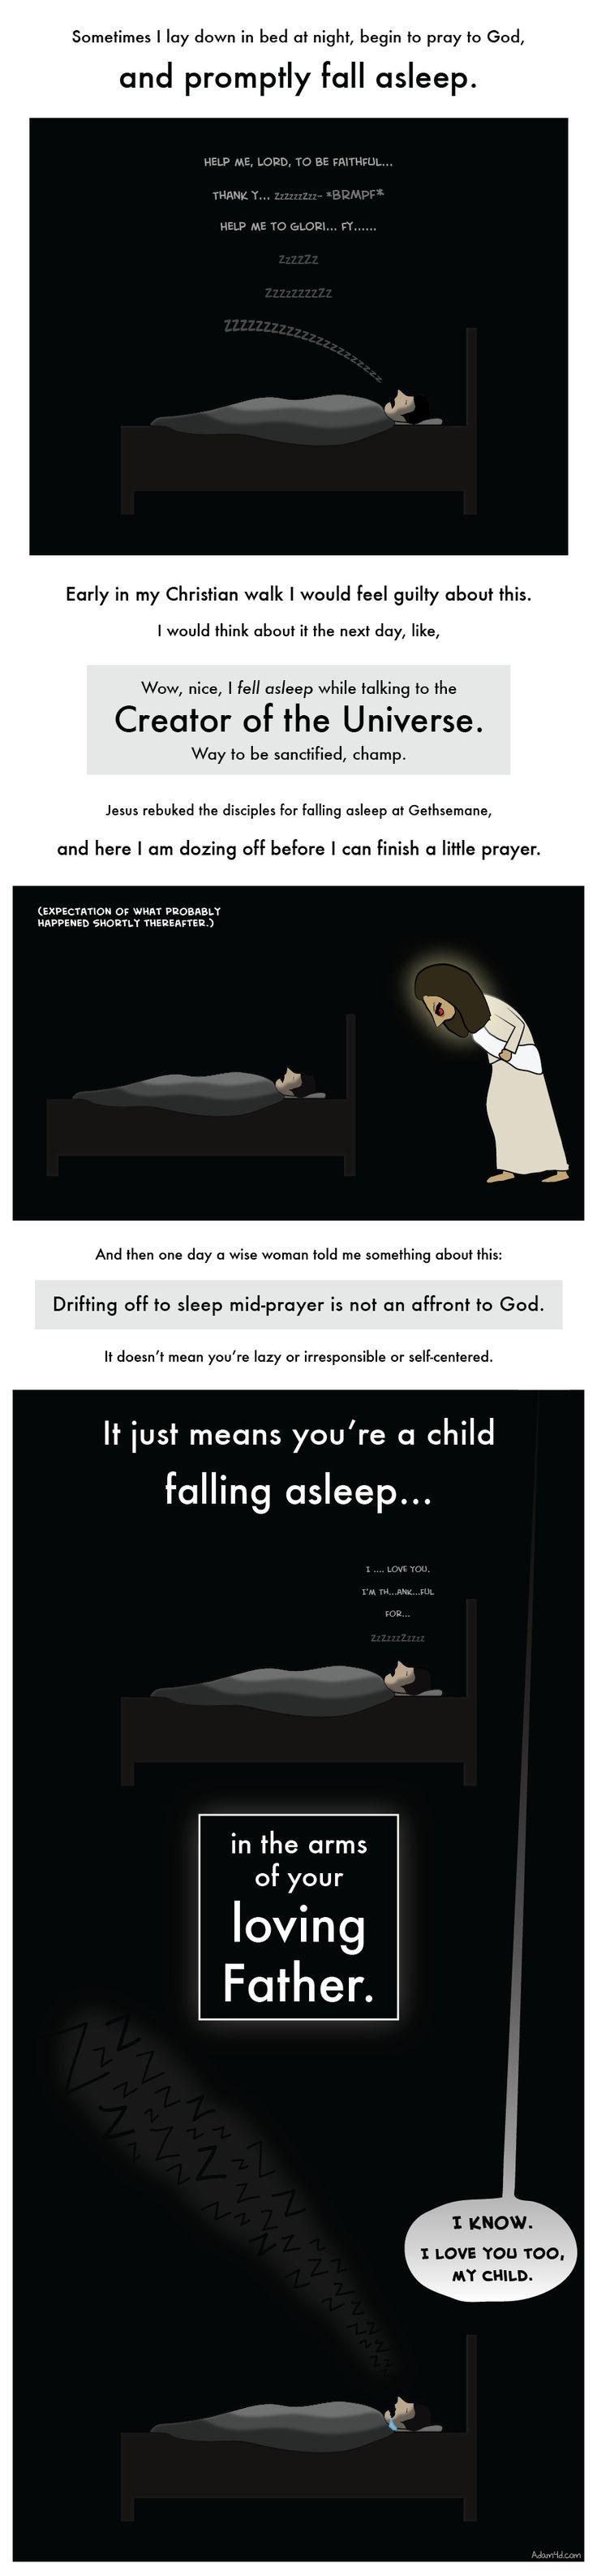 how to make myself fall asleep